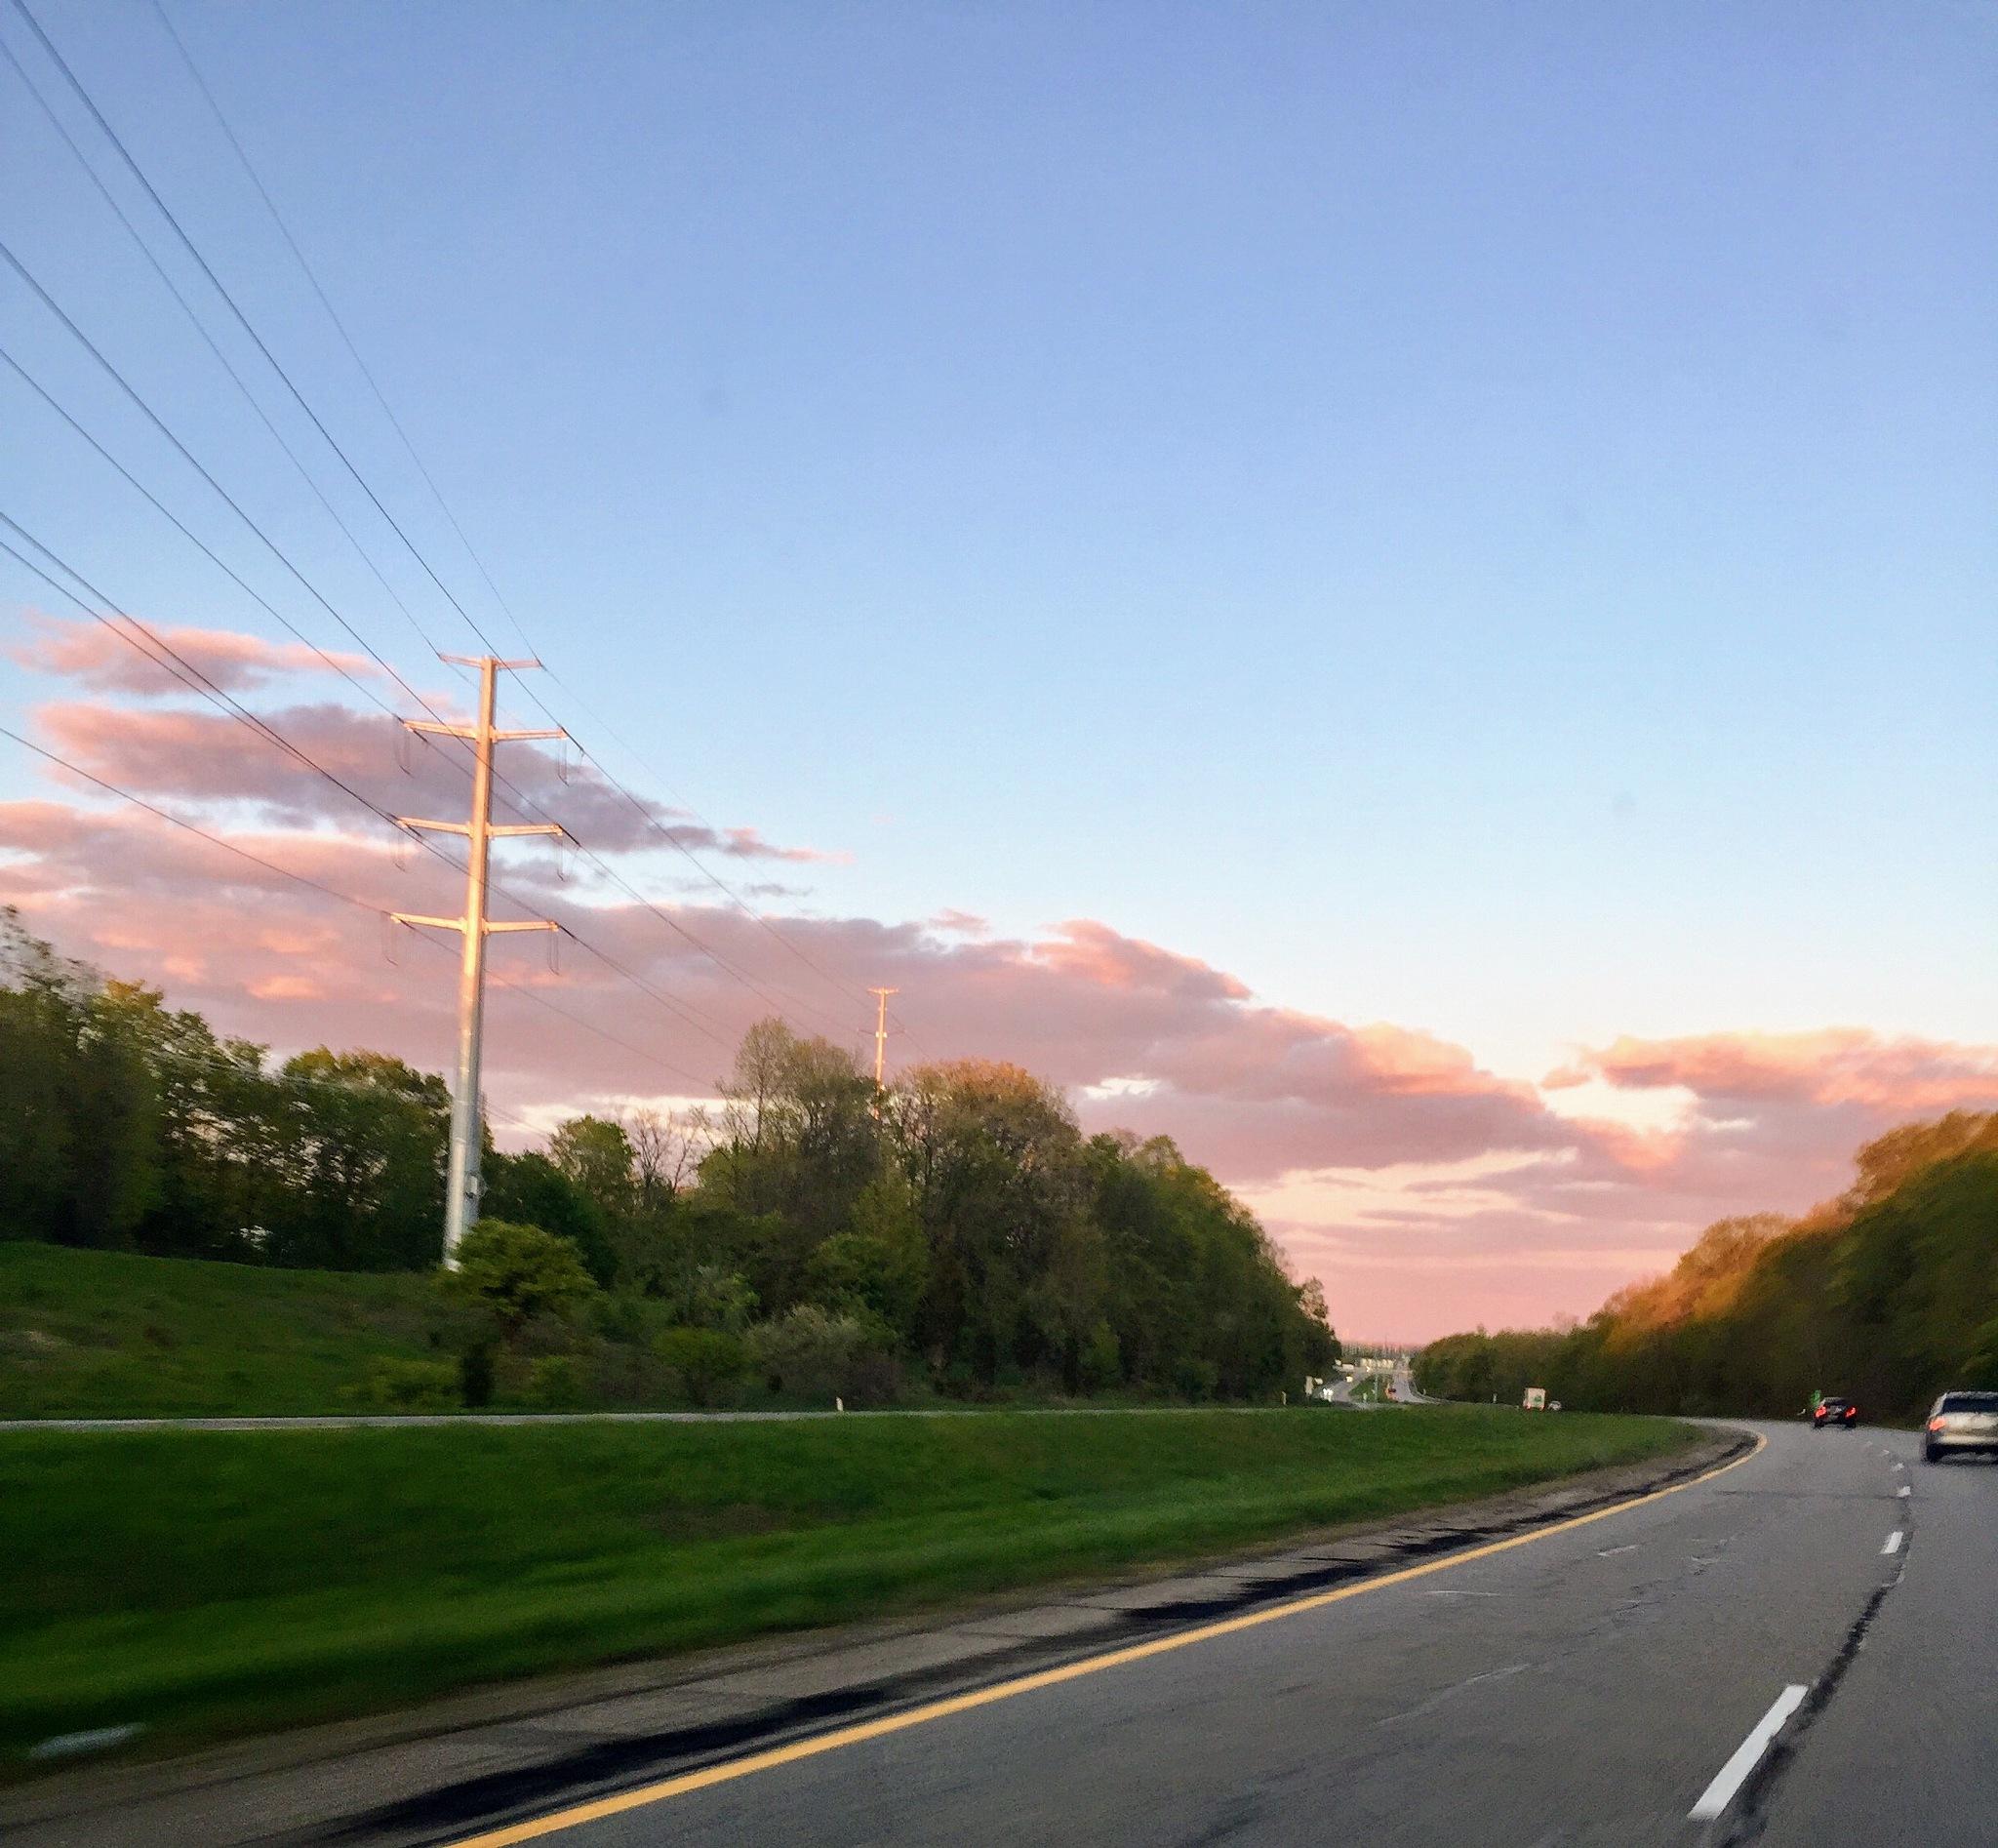 Sunday Drive Home by Mgrinage